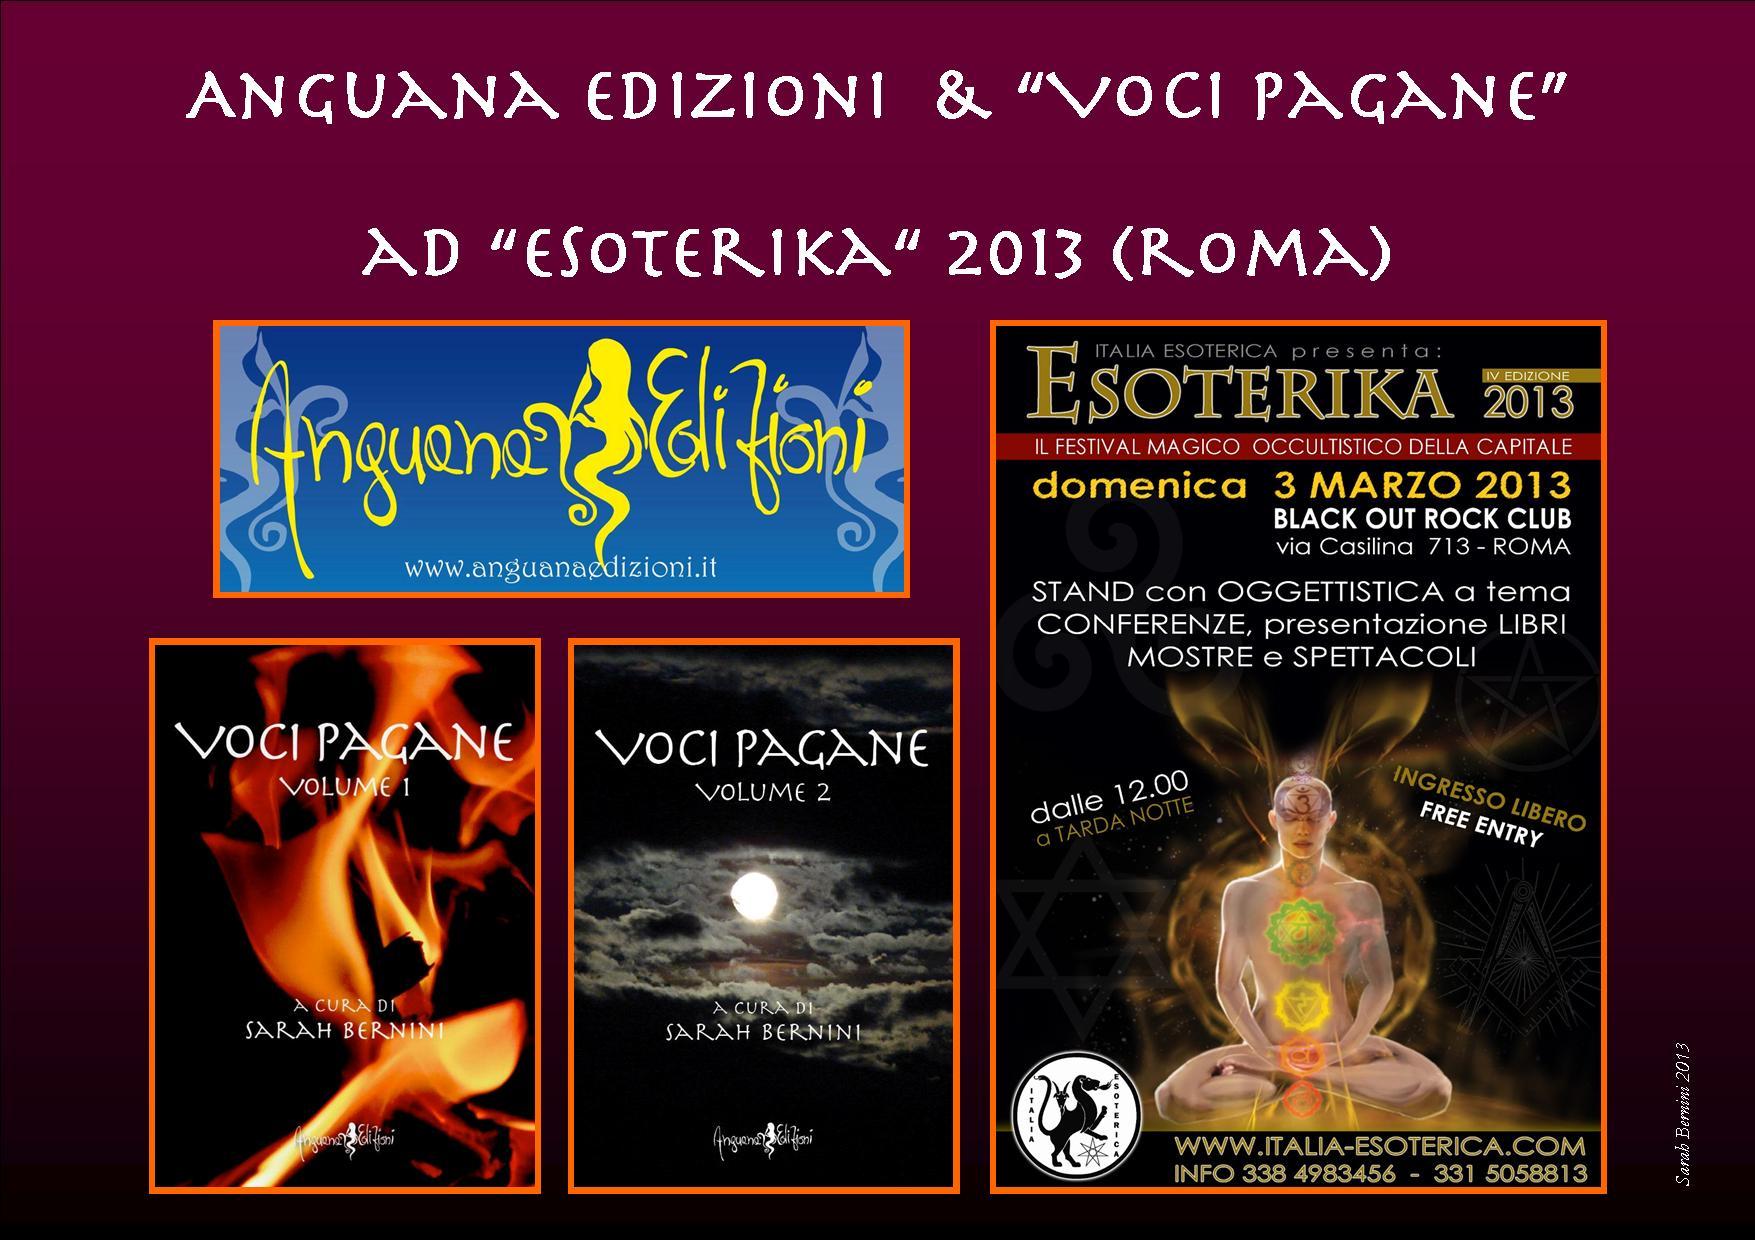 Anguana edizioni e Voci Pagane ad Esoterika 2013